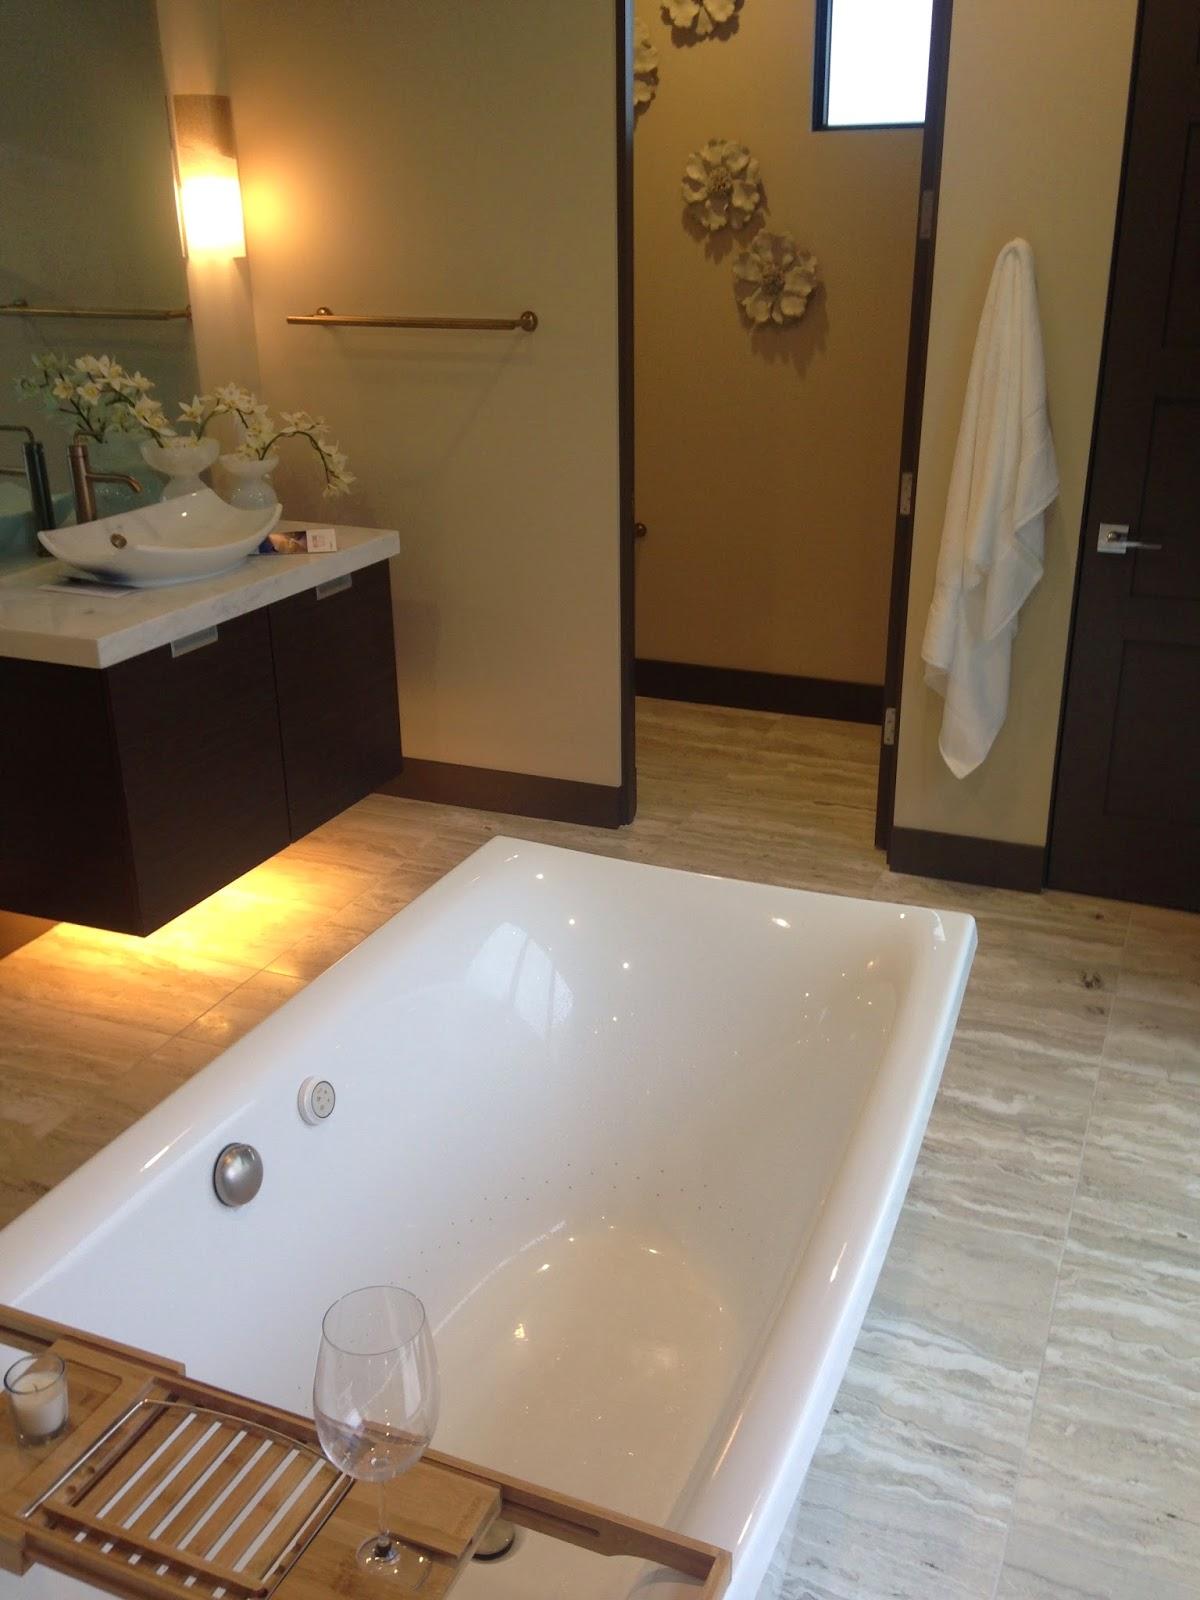 International builders show 2015, New american home master bath